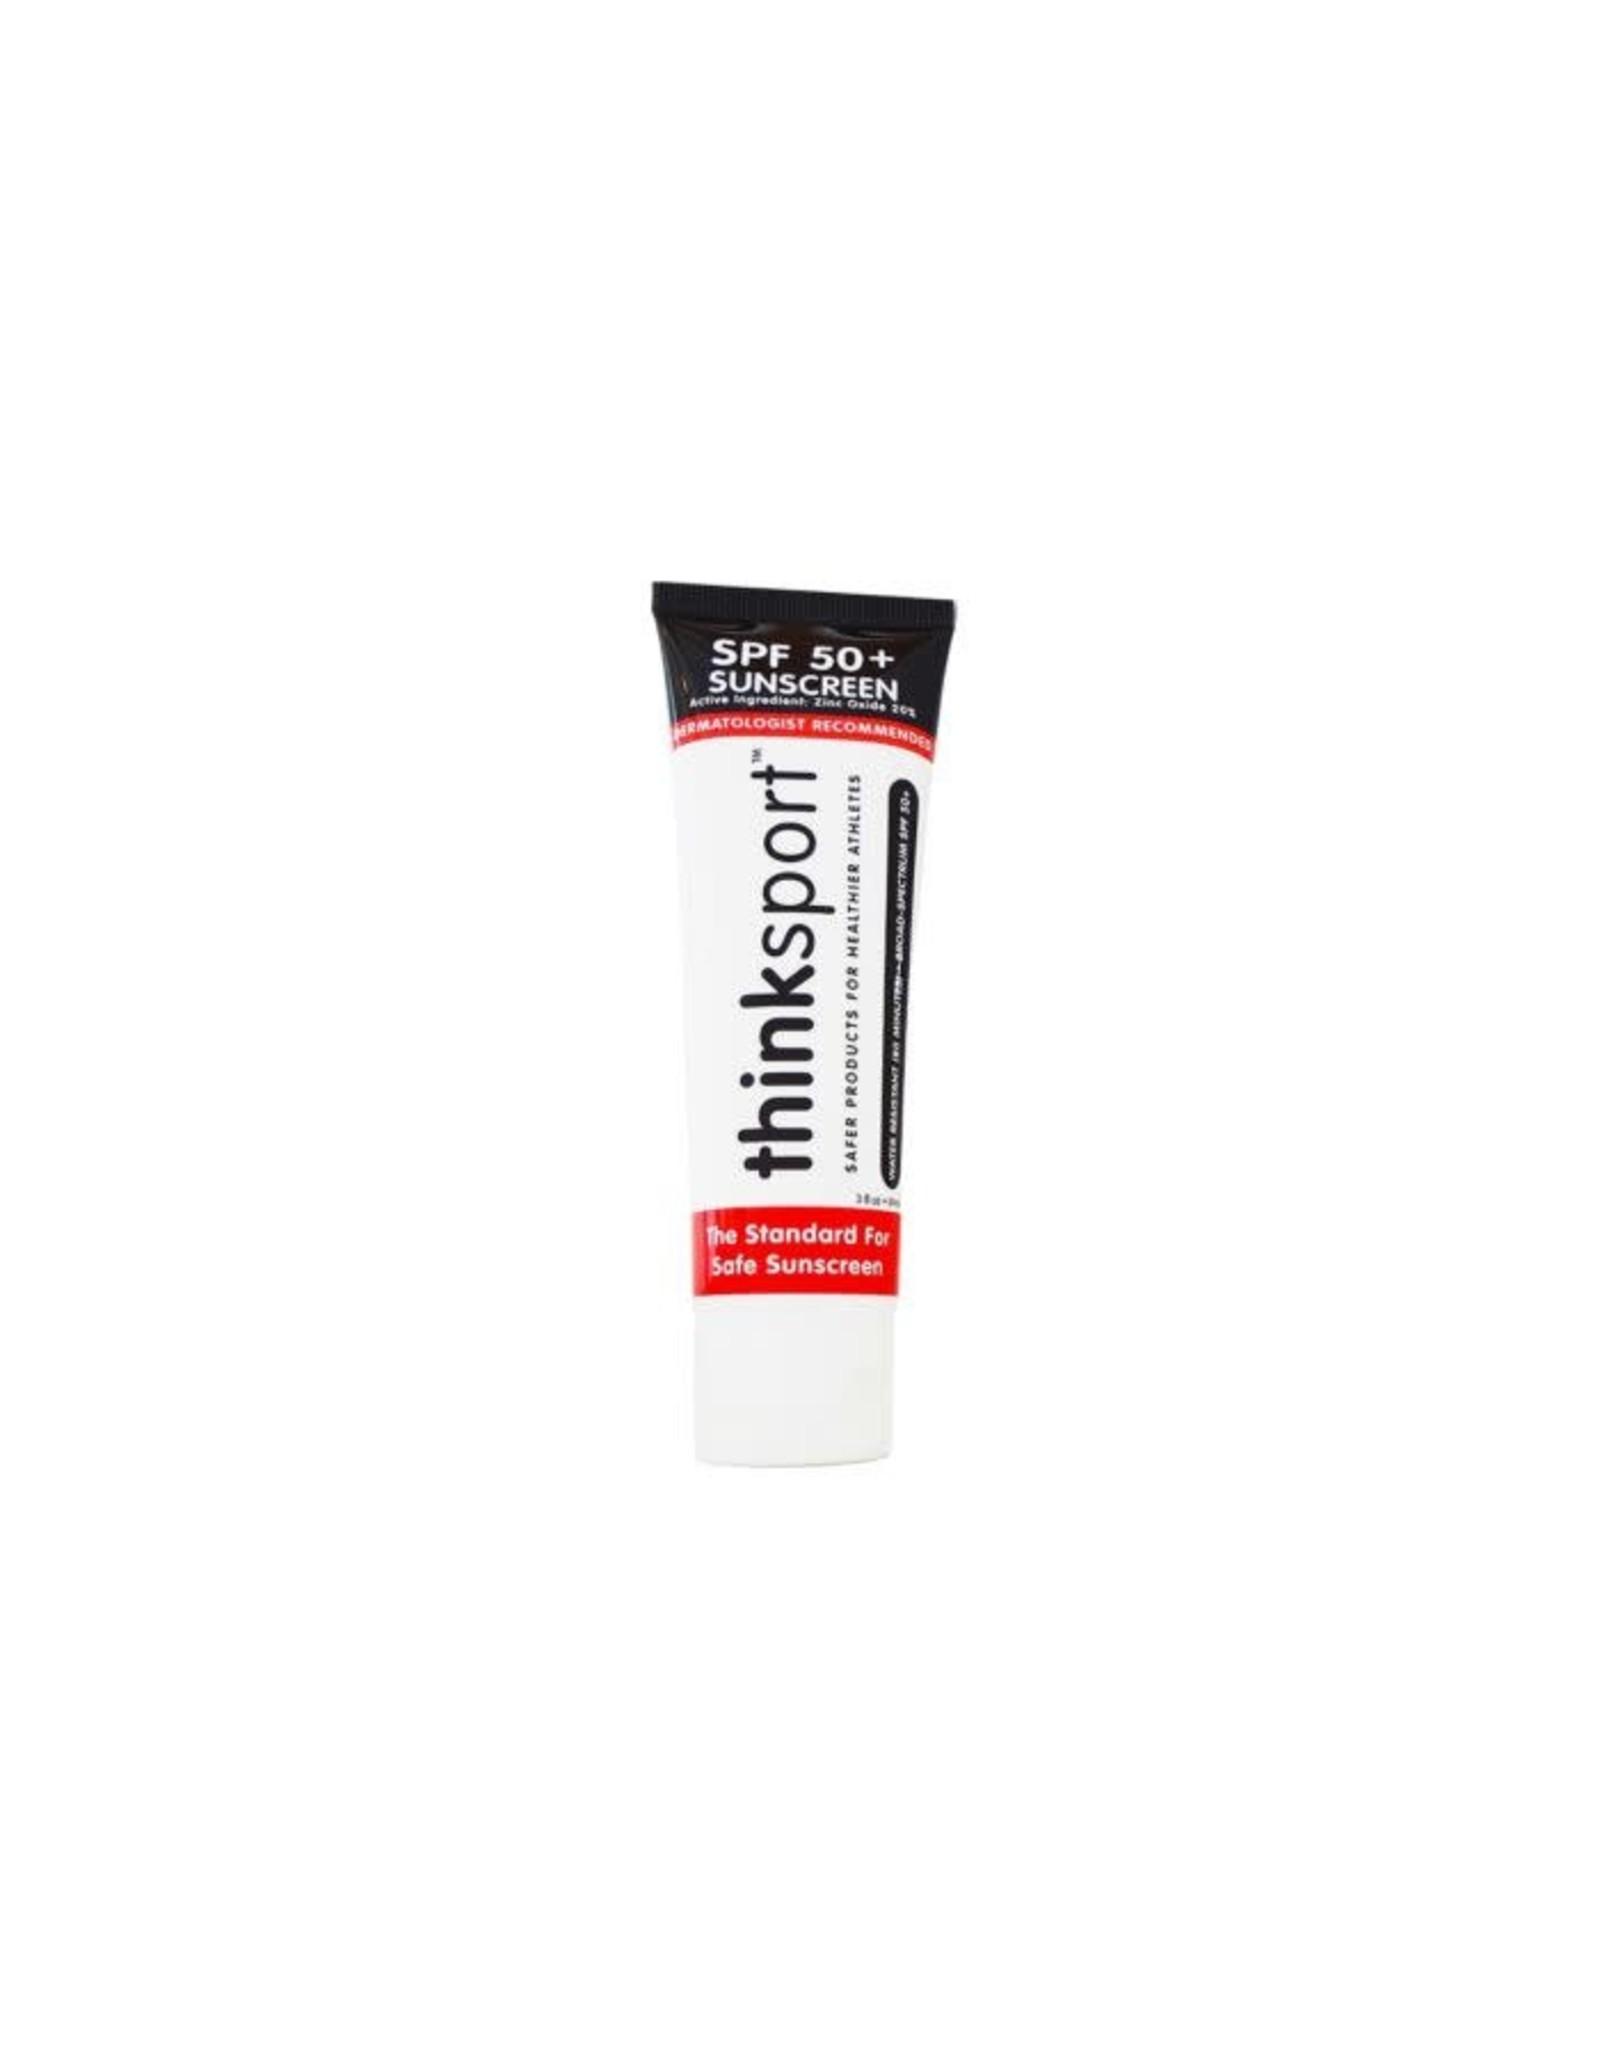 Thinkbaby Thinksport Sunscreen SPF 50+, 3 oz